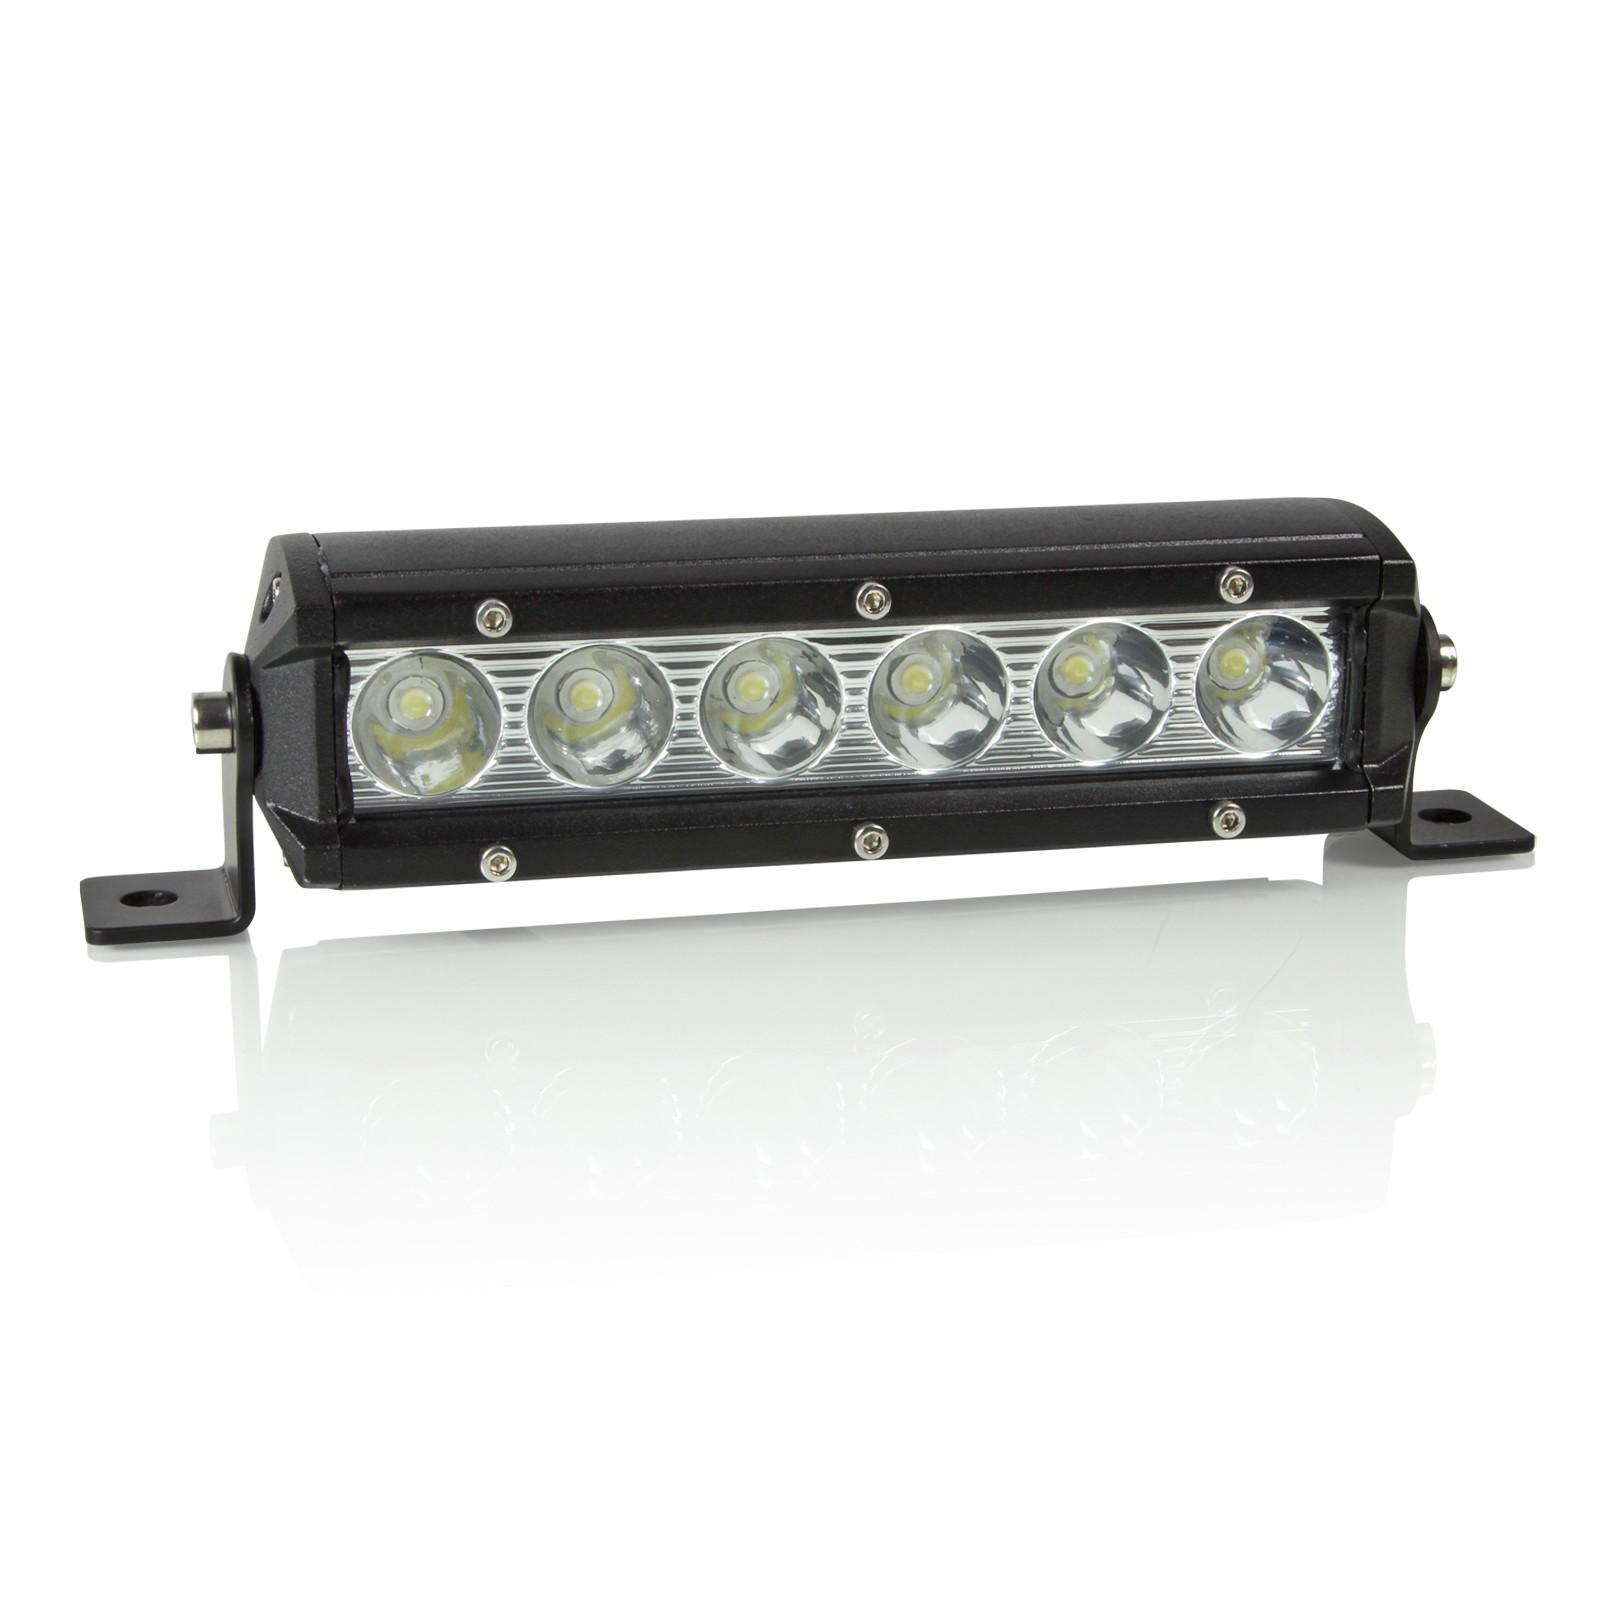 Project ra dominator 7 inch led light bar top tier autoparts project ra dominator 7 inch led light bar aloadofball Gallery